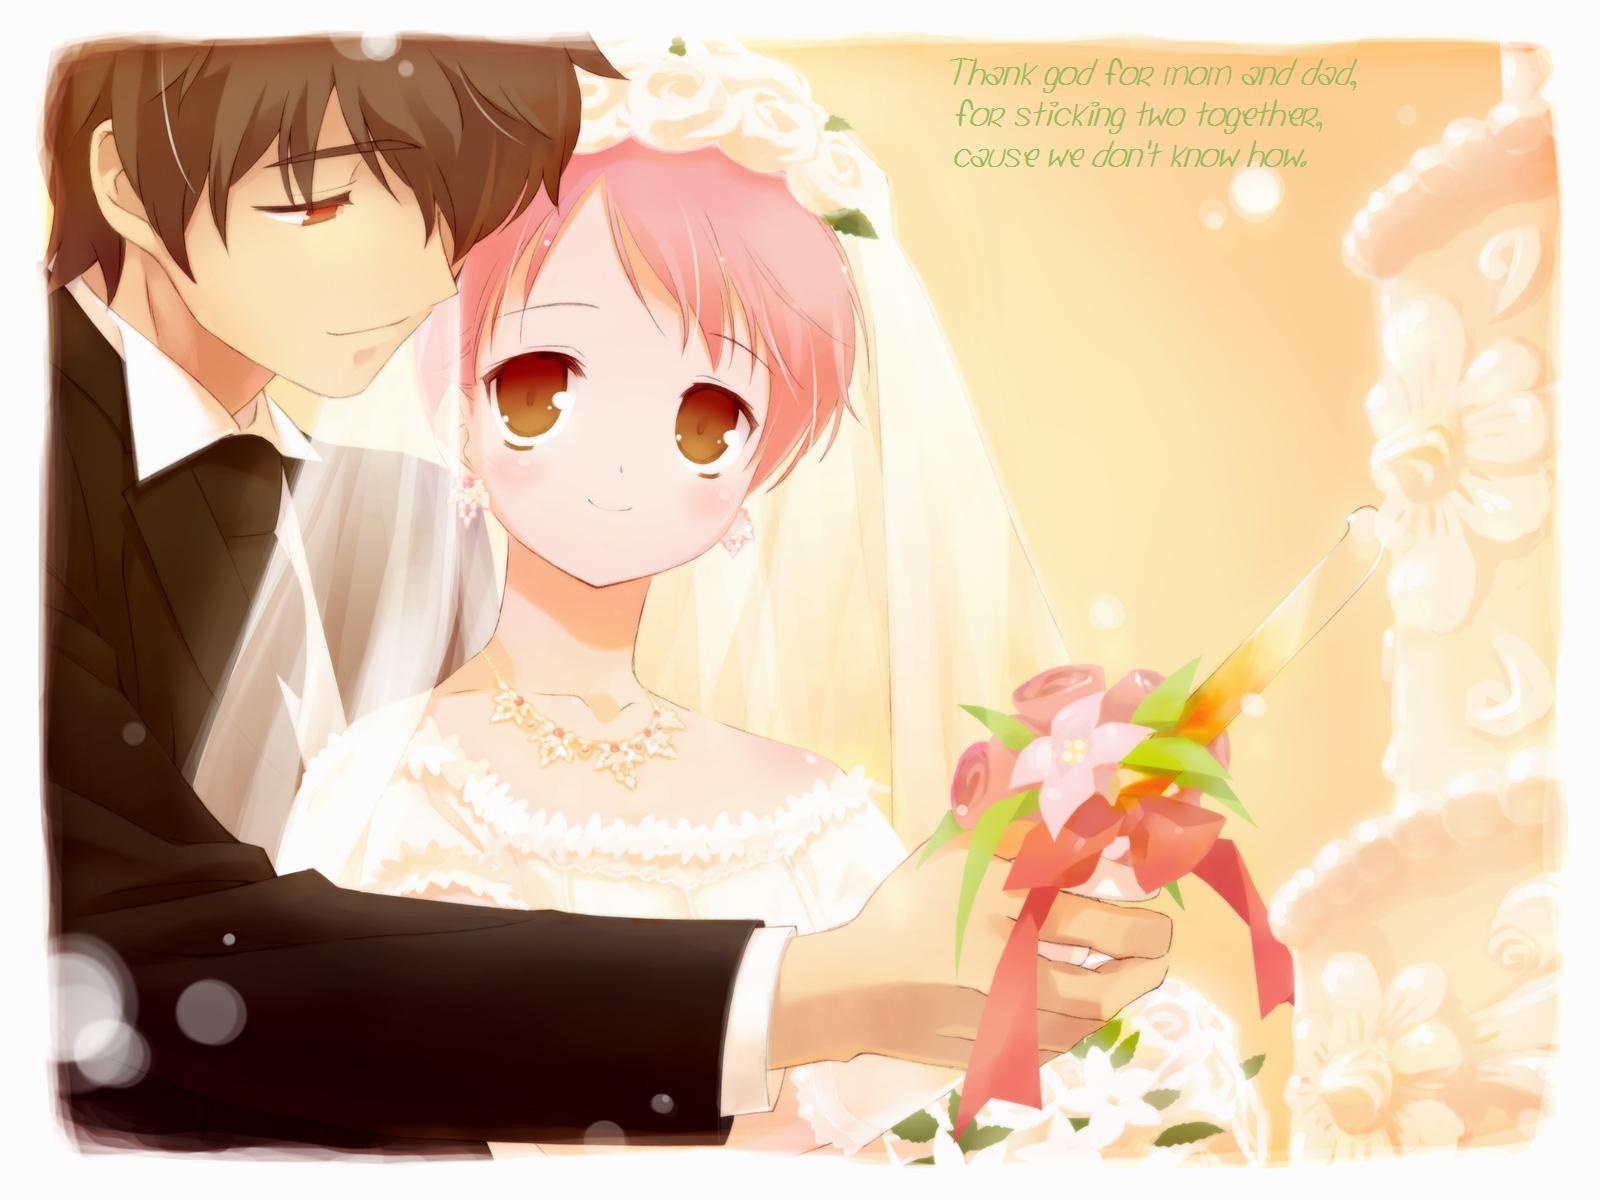 http://2.bp.blogspot.com/_OEz6yV_Hgws/TNMCW5cl3zI/AAAAAAAACvQ/Fidps_loknU/s1600/Anime_love_wallpaper_Hey_Ya_by_LinkaIstheShit.jpg